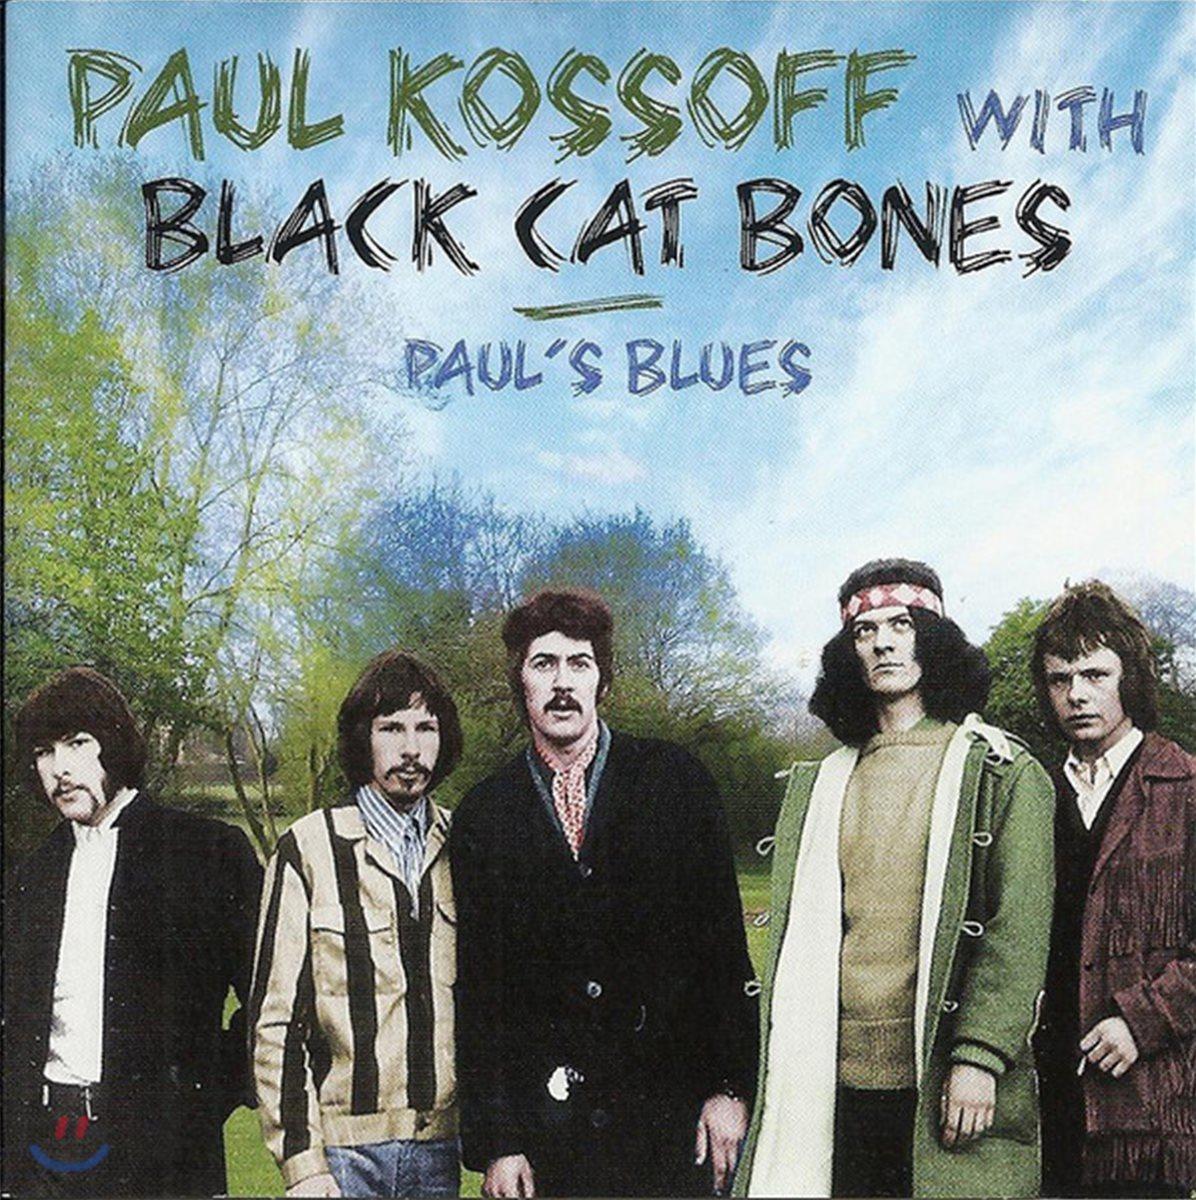 Paul Kossoff & Black Cat Bones (폴 코소프 & 블랙 캣 본즈) - Paul's Blues